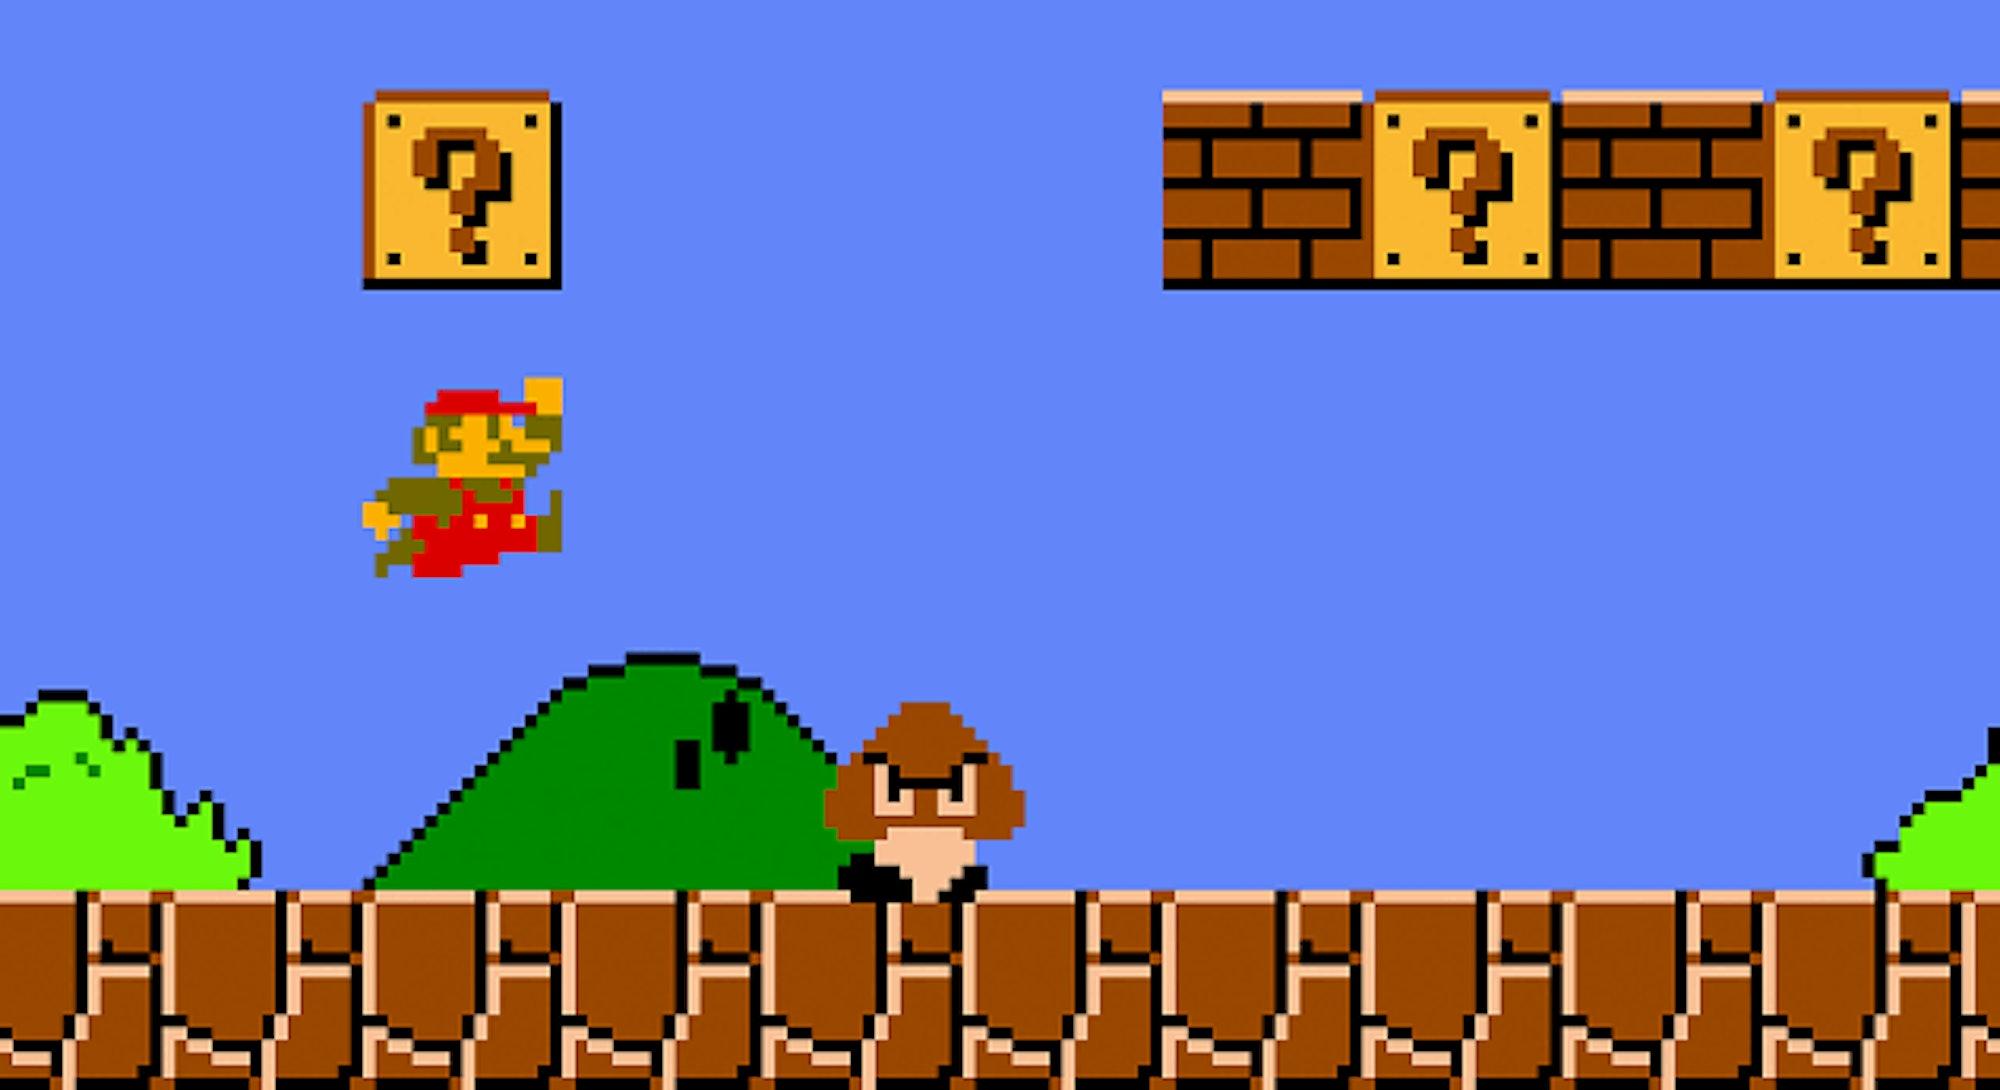 Mario jumping over goomba in Super Mario Bros.